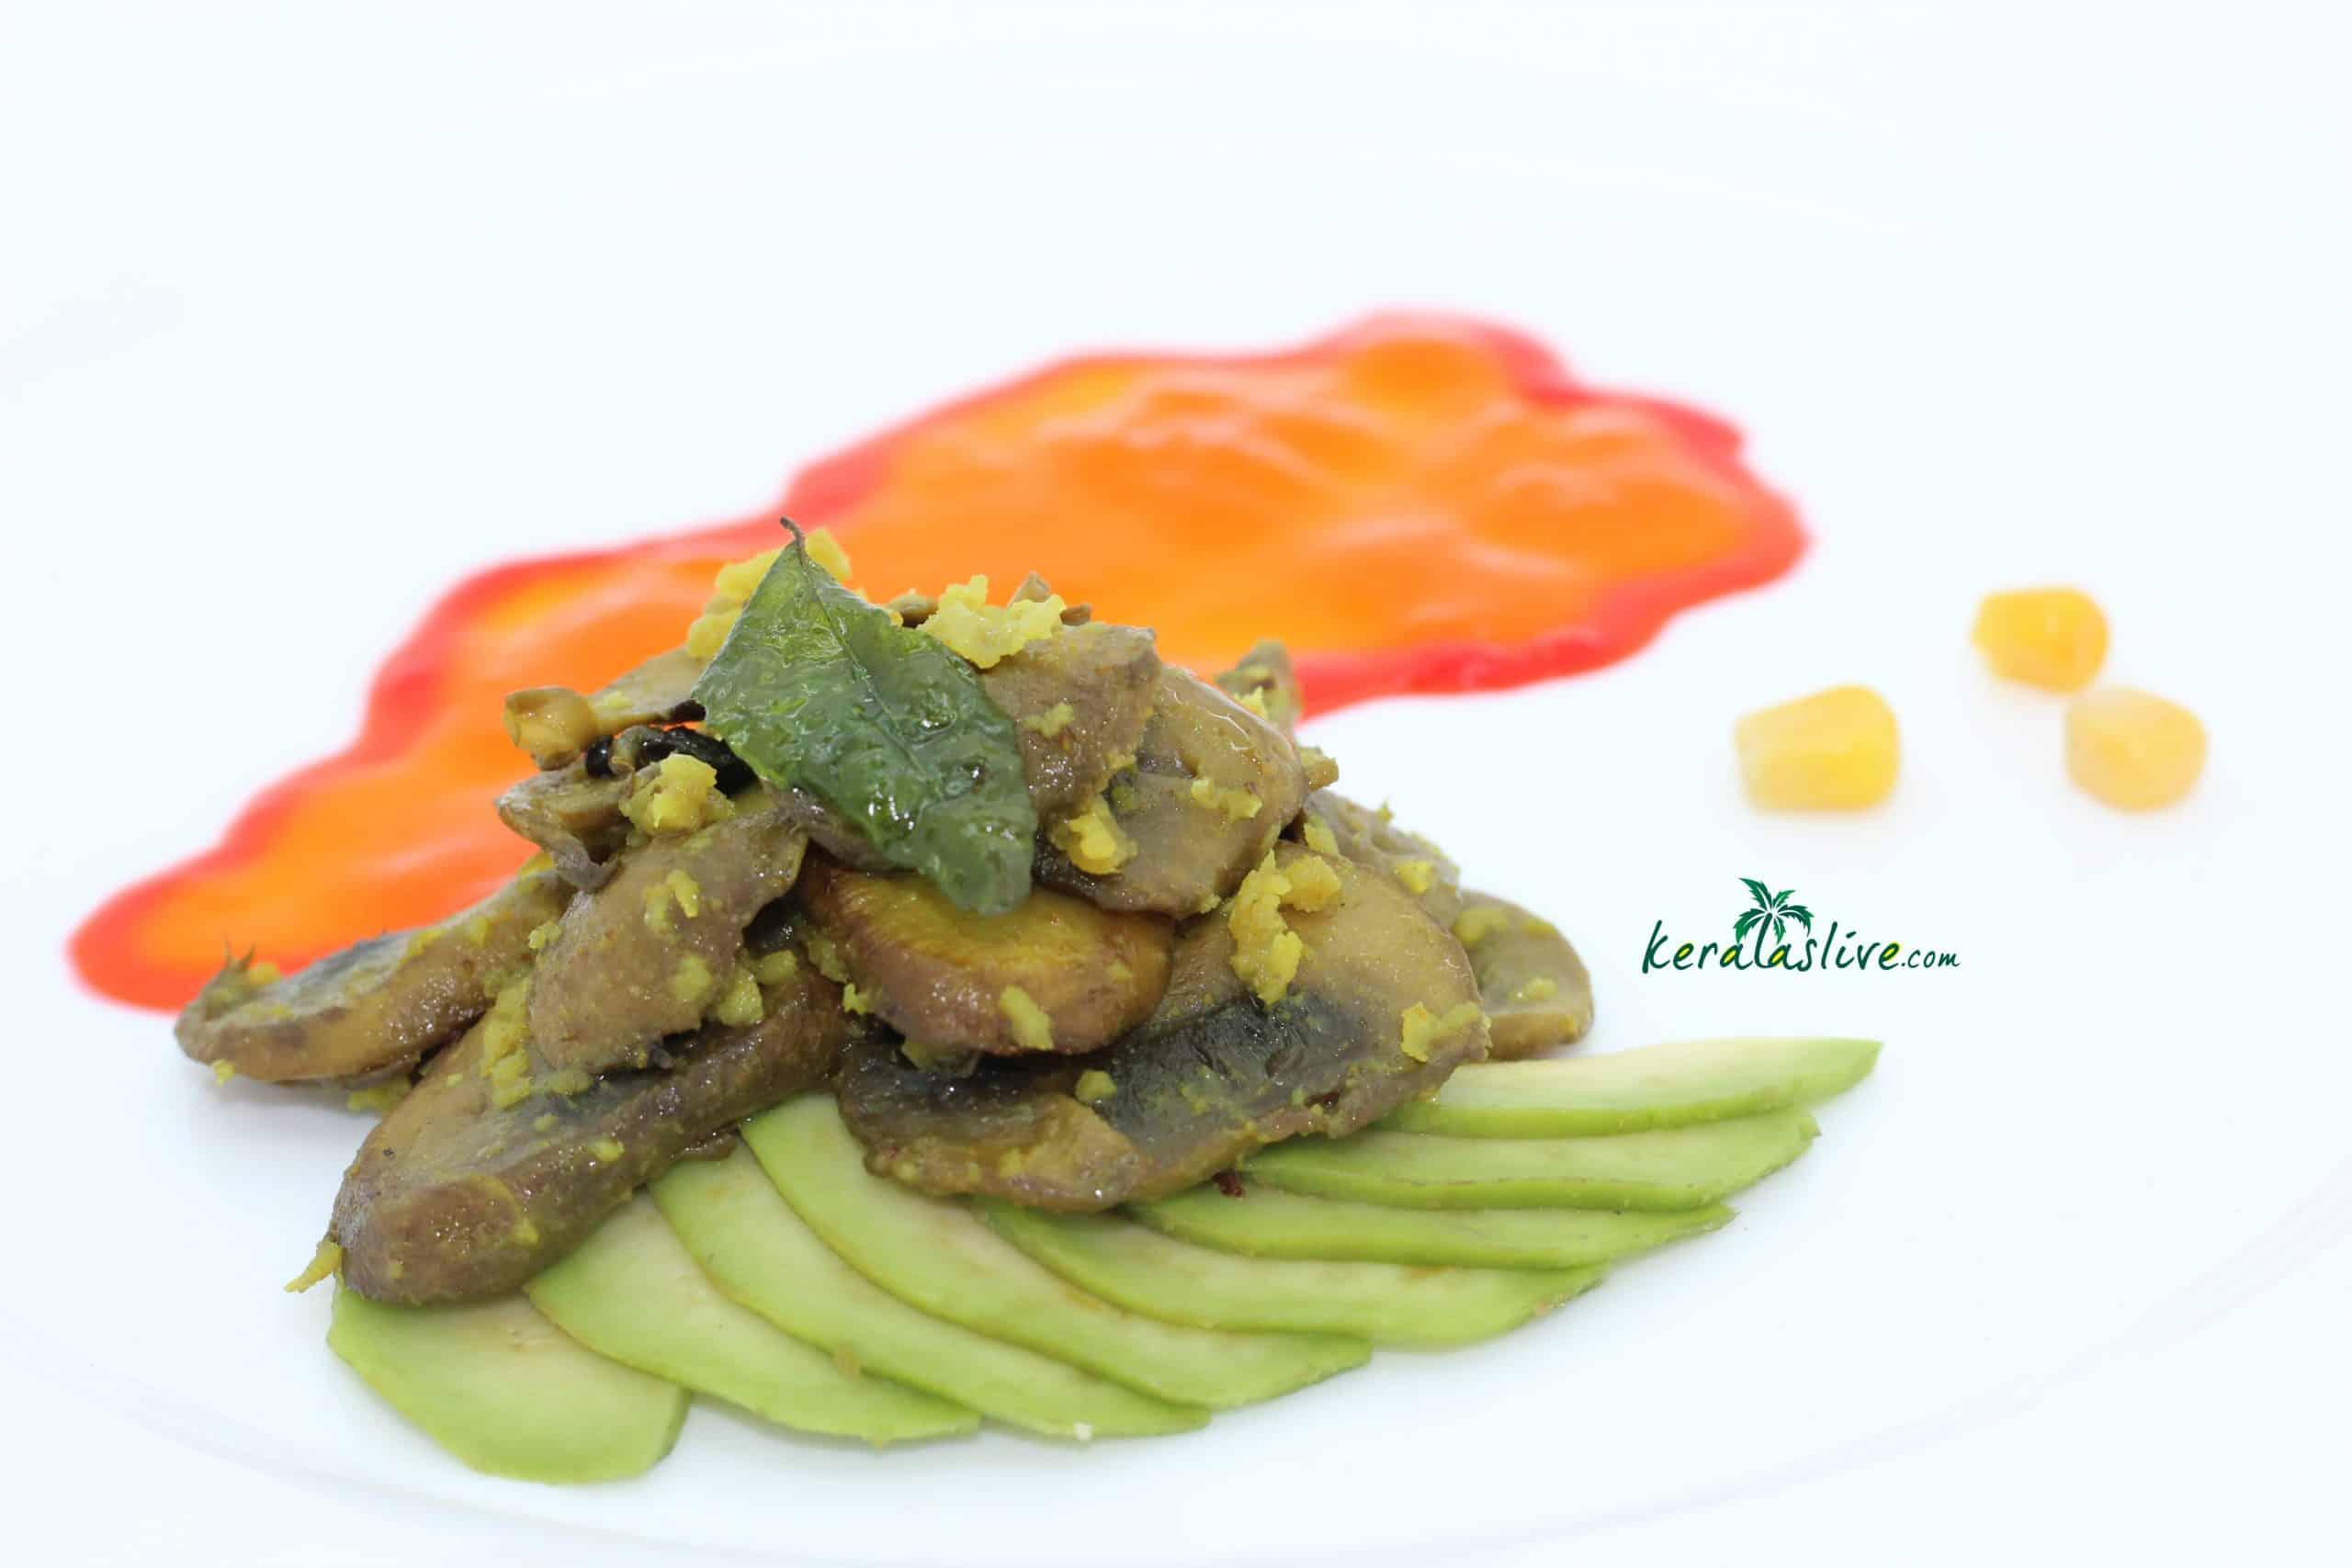 recipe for Koon fry / Spicy sautéed mushrooms